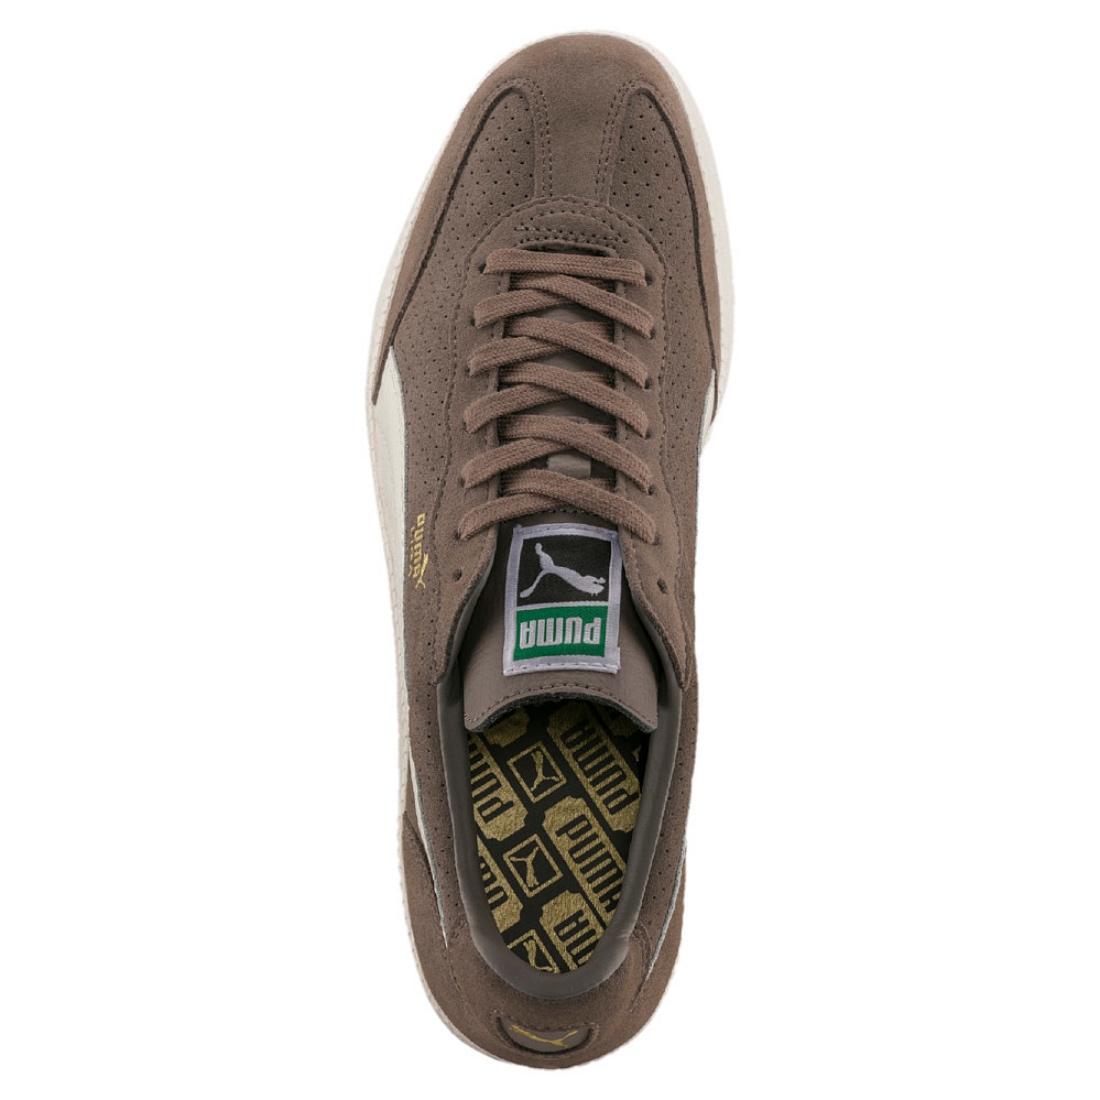 3d360eec0b Puma Liga Suede 364932 Retro Sneakers Schuhe Ikone RESTPOSTEN ...